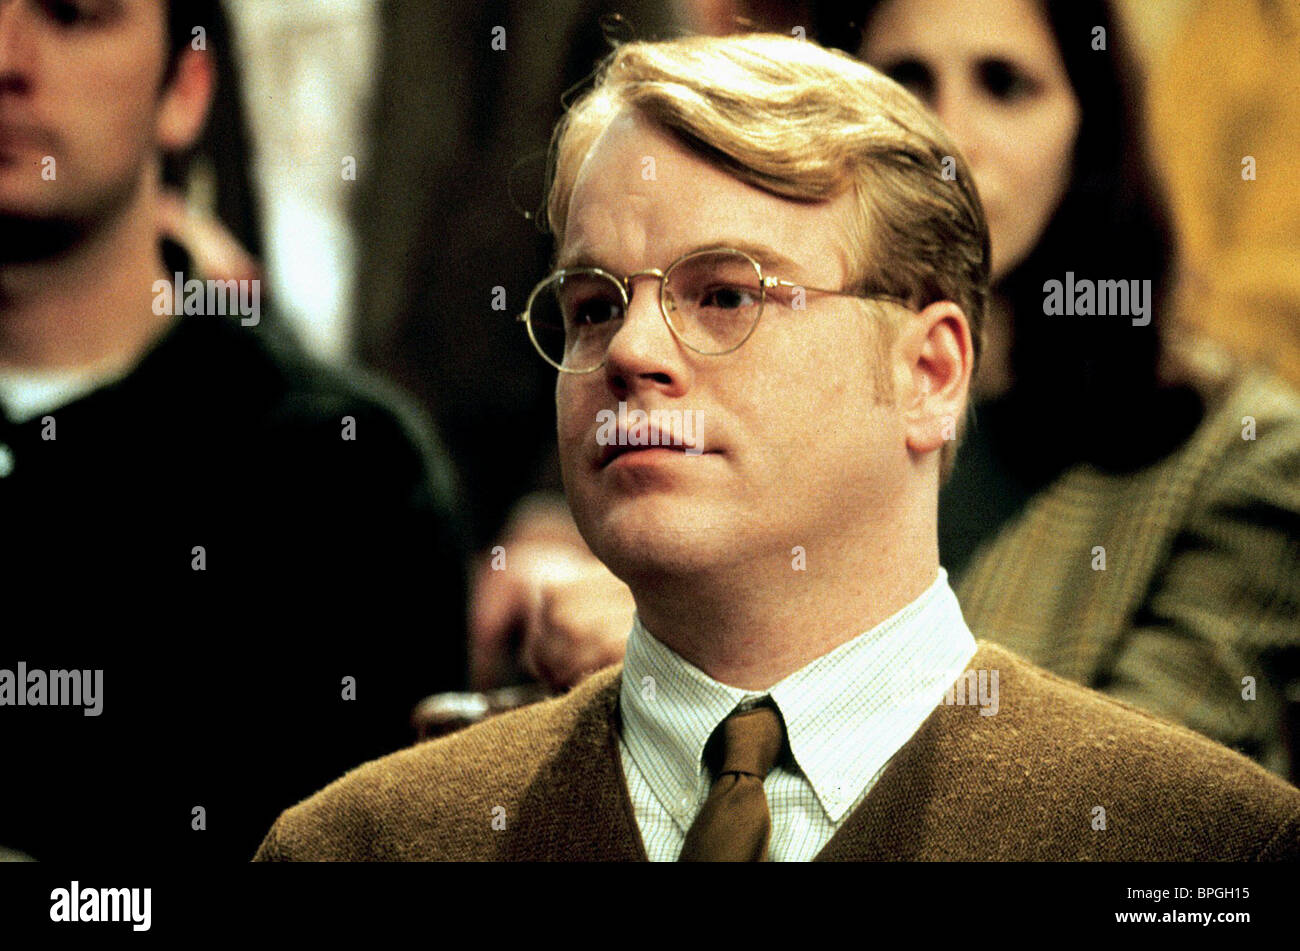 Philip Seymour Hoffman Patch Adams 1998 Stock Photo Alamy